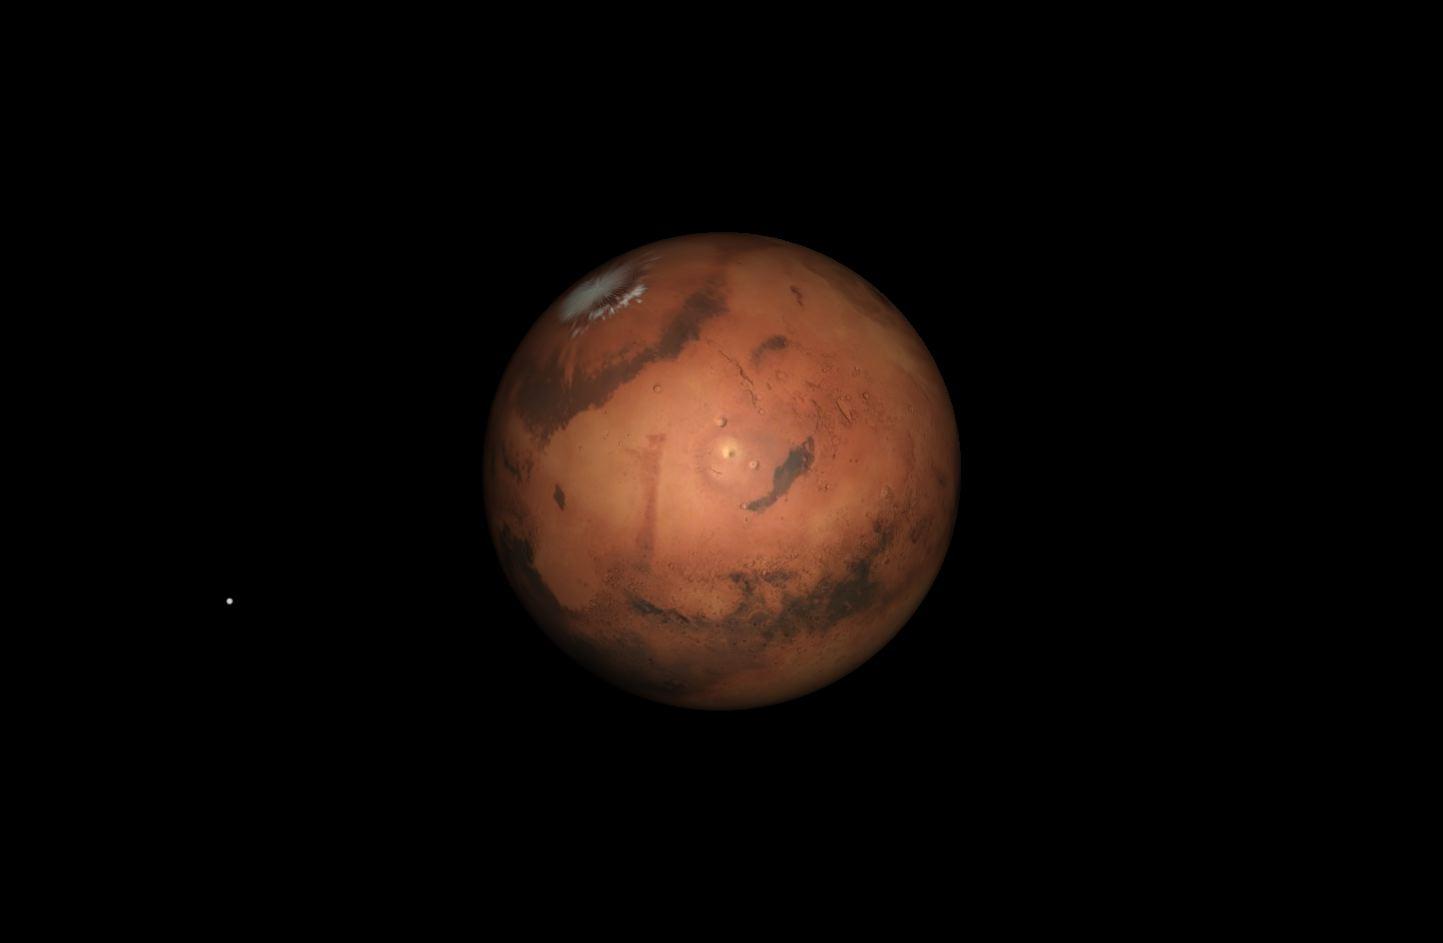 Mars Closest Approach, April 2014